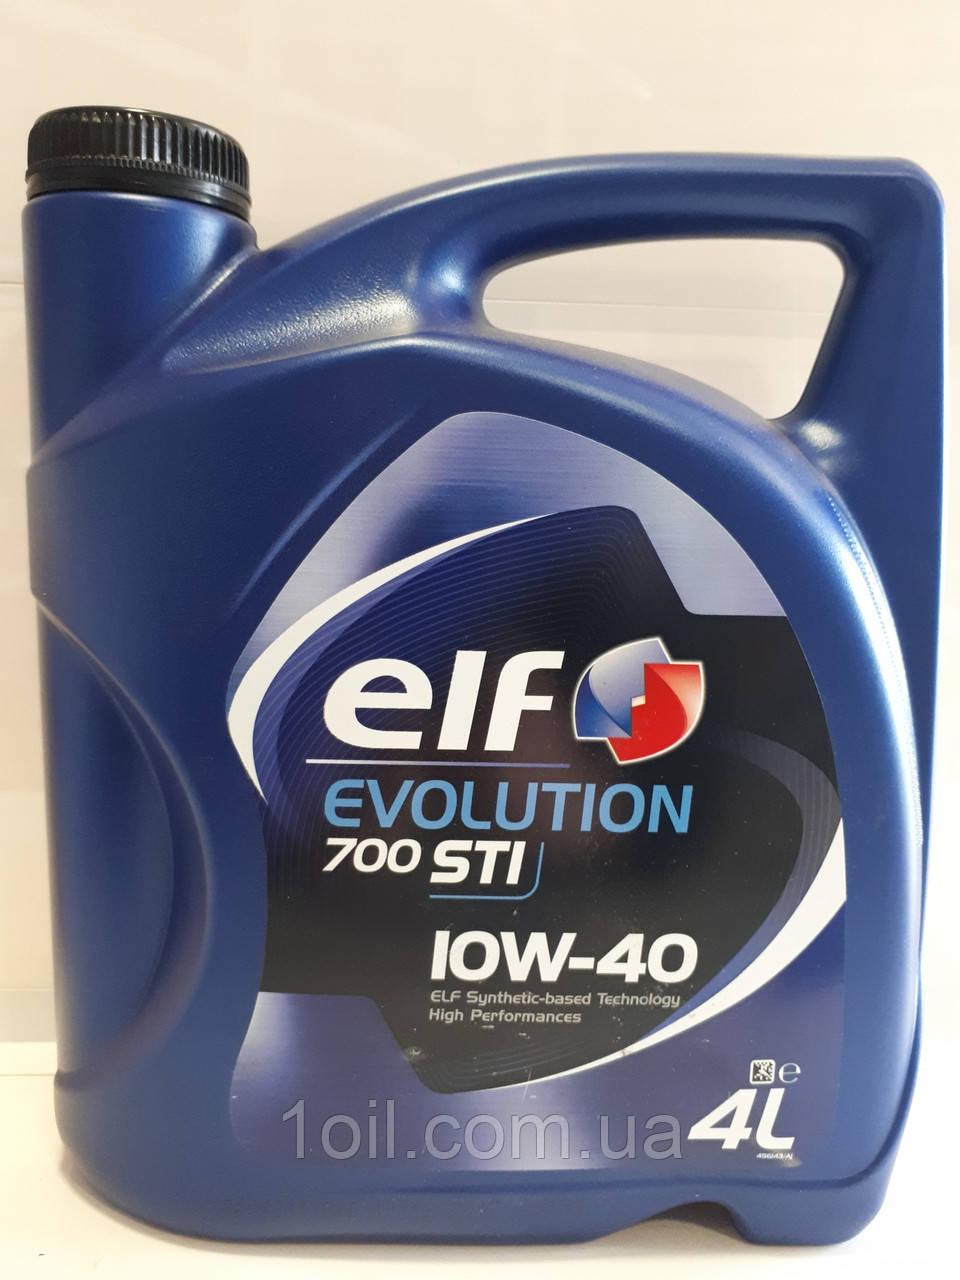 Масло моторное ELF Evolution 700 STI 10W-40 4l